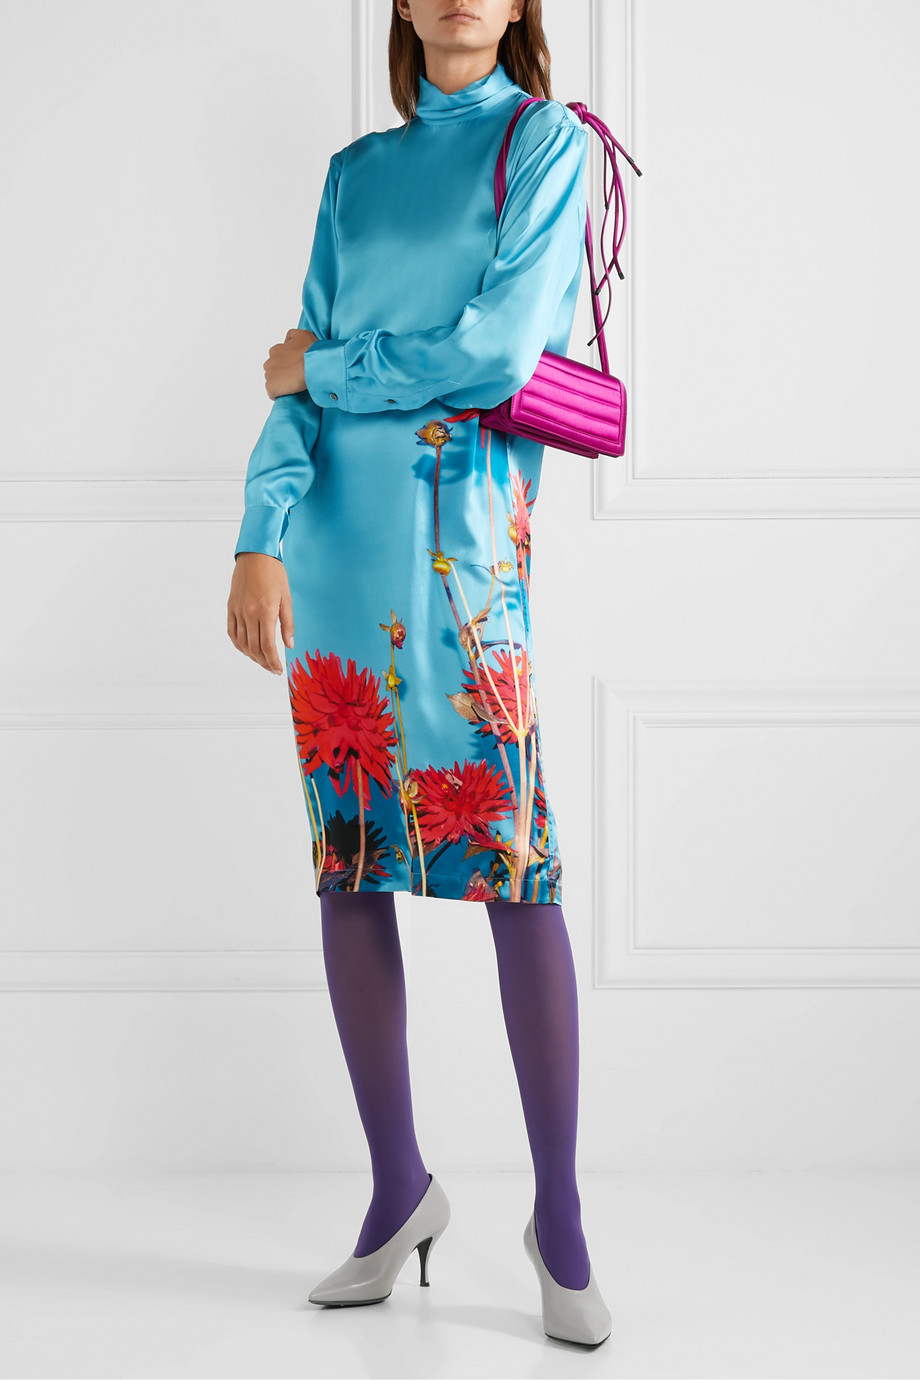 Dries Van Noten Dontisy floral-print satin dress